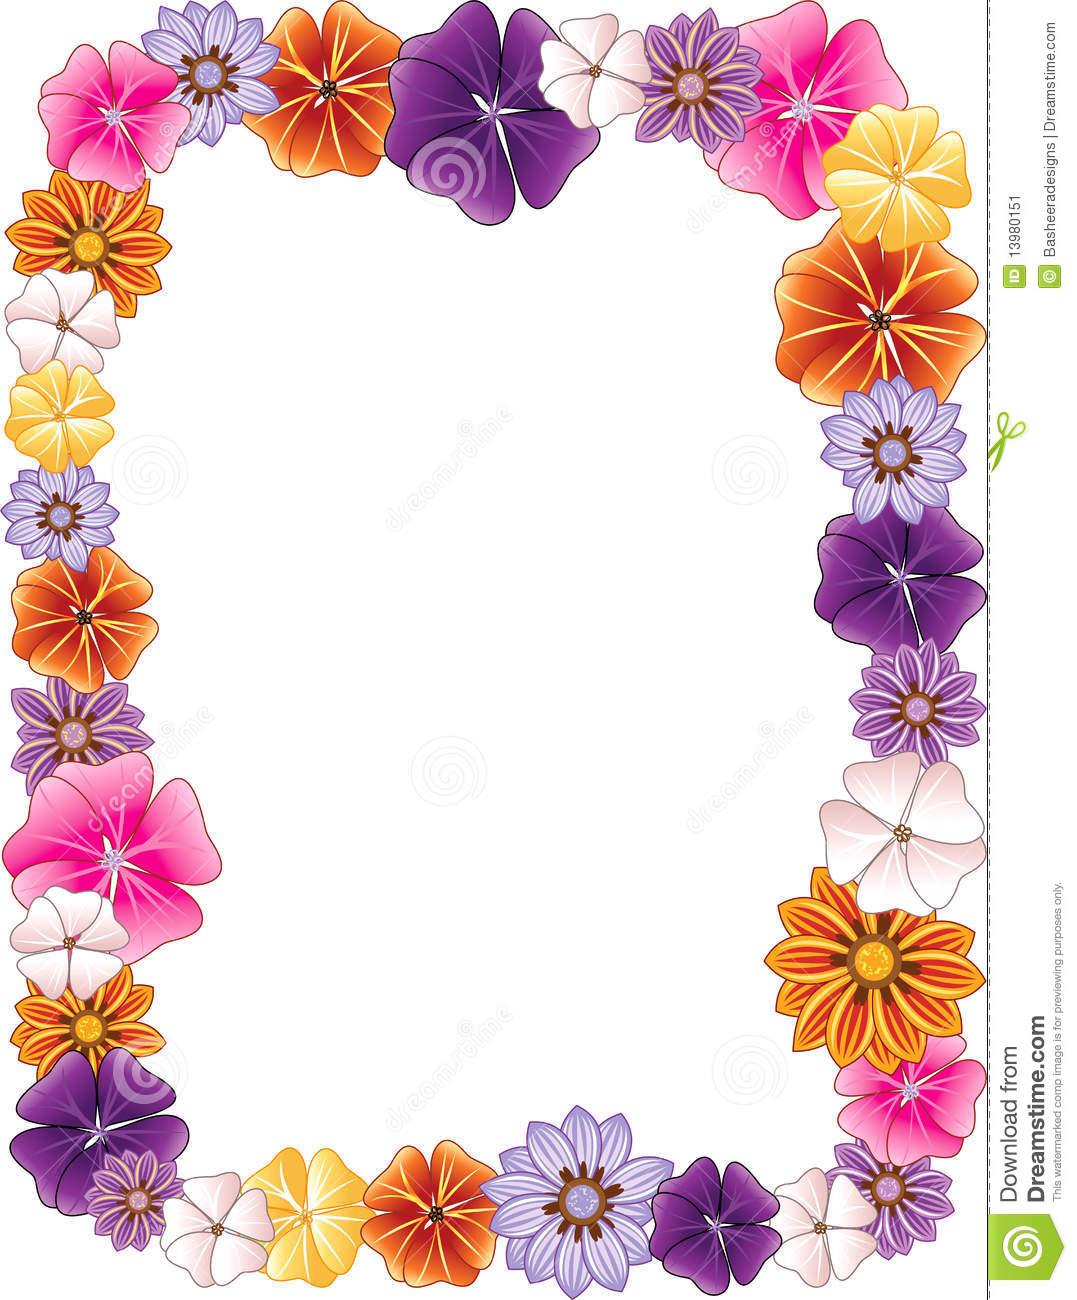 1077x1300 Flowers Border Clipart